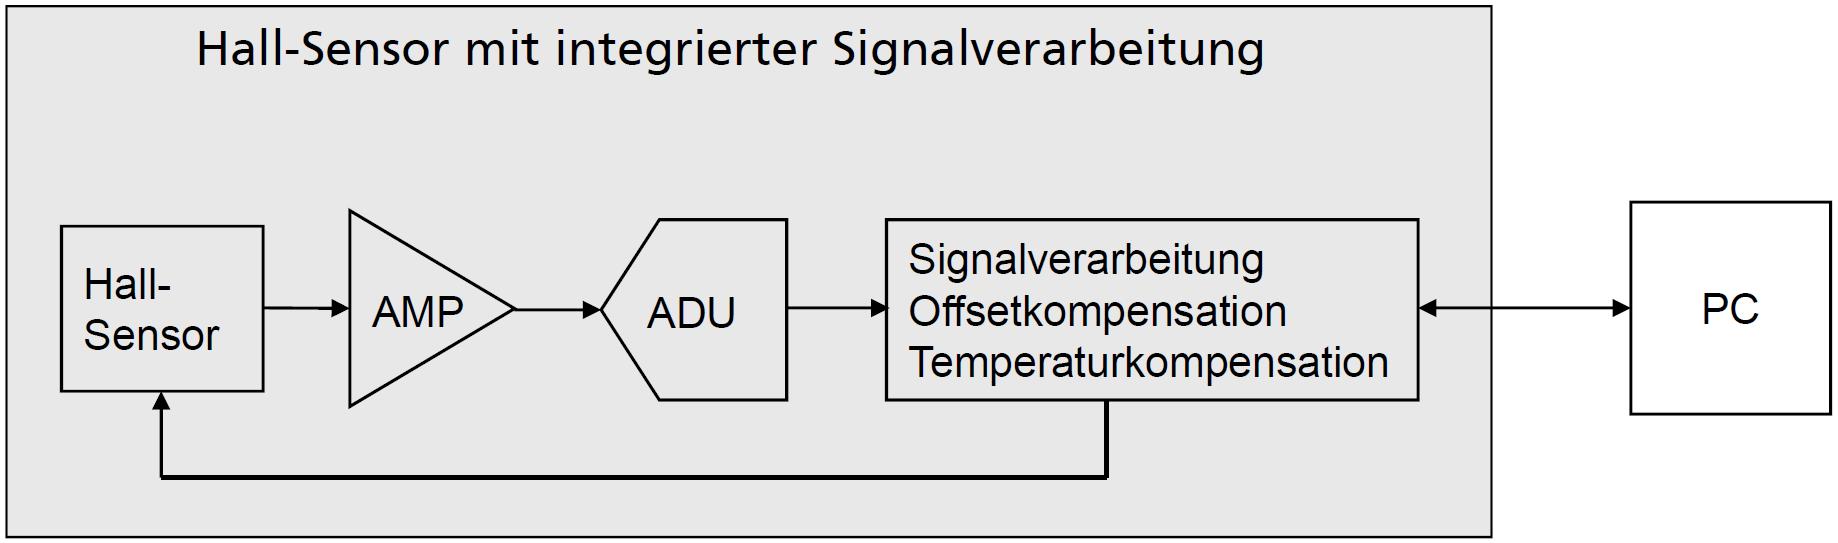 Dateihall Sensor Mit Integrierter Signalverarbeitung Wikipedia Hall